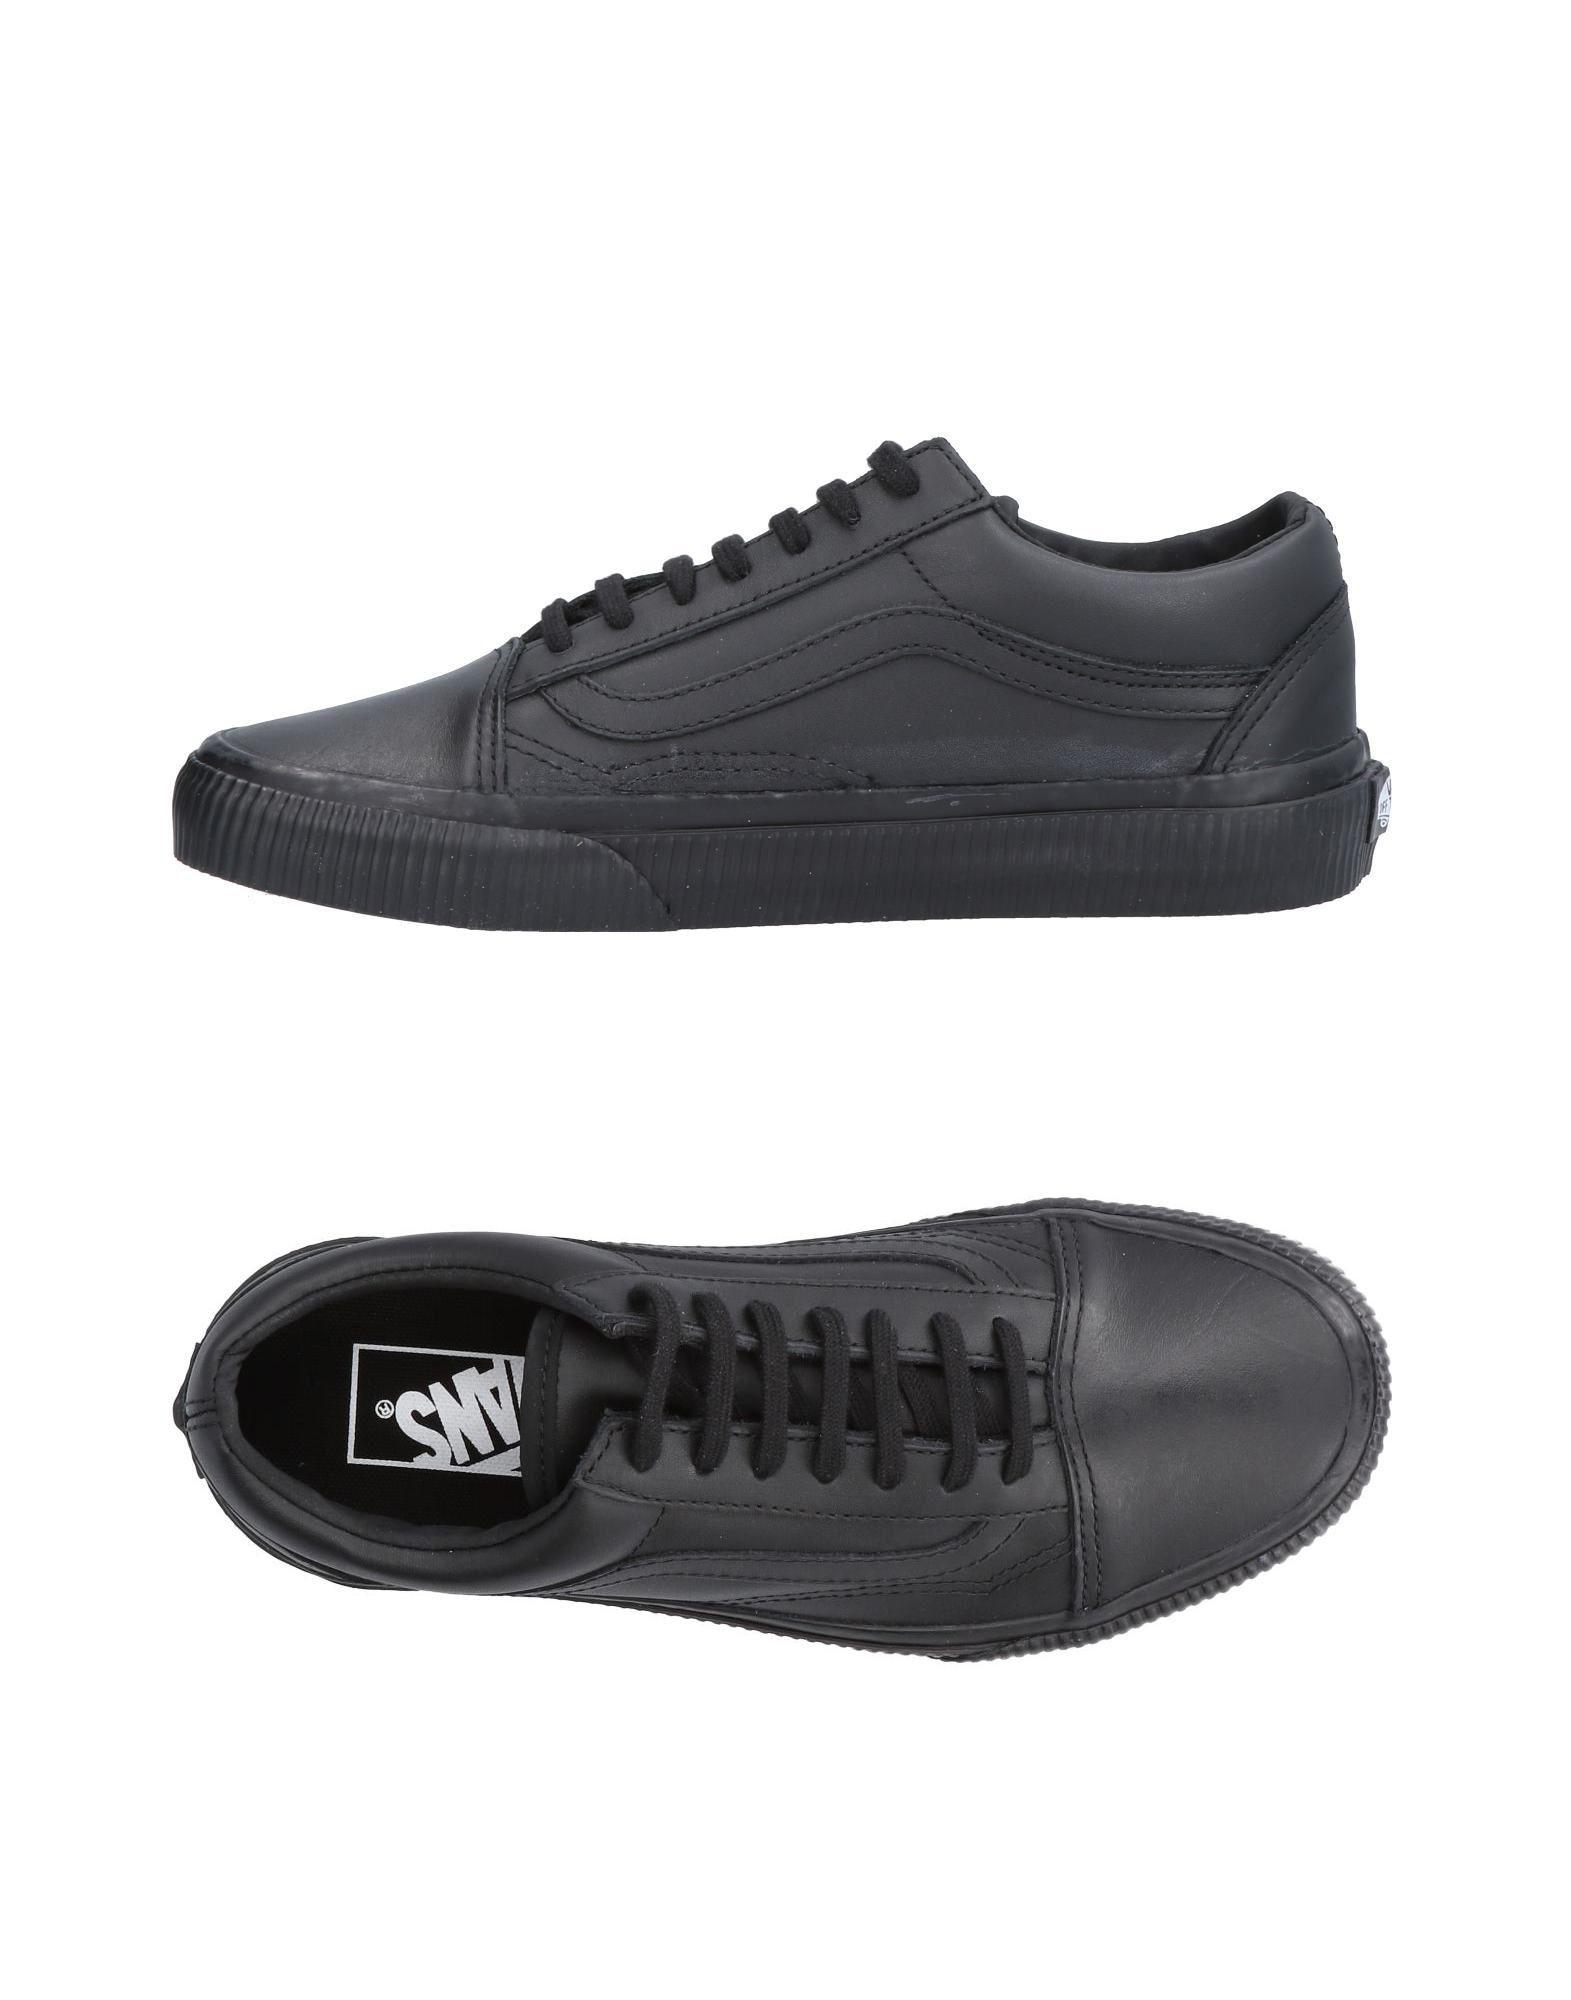 Vans Sneakers Damen  11475938FN Gute Qualität beliebte Schuhe